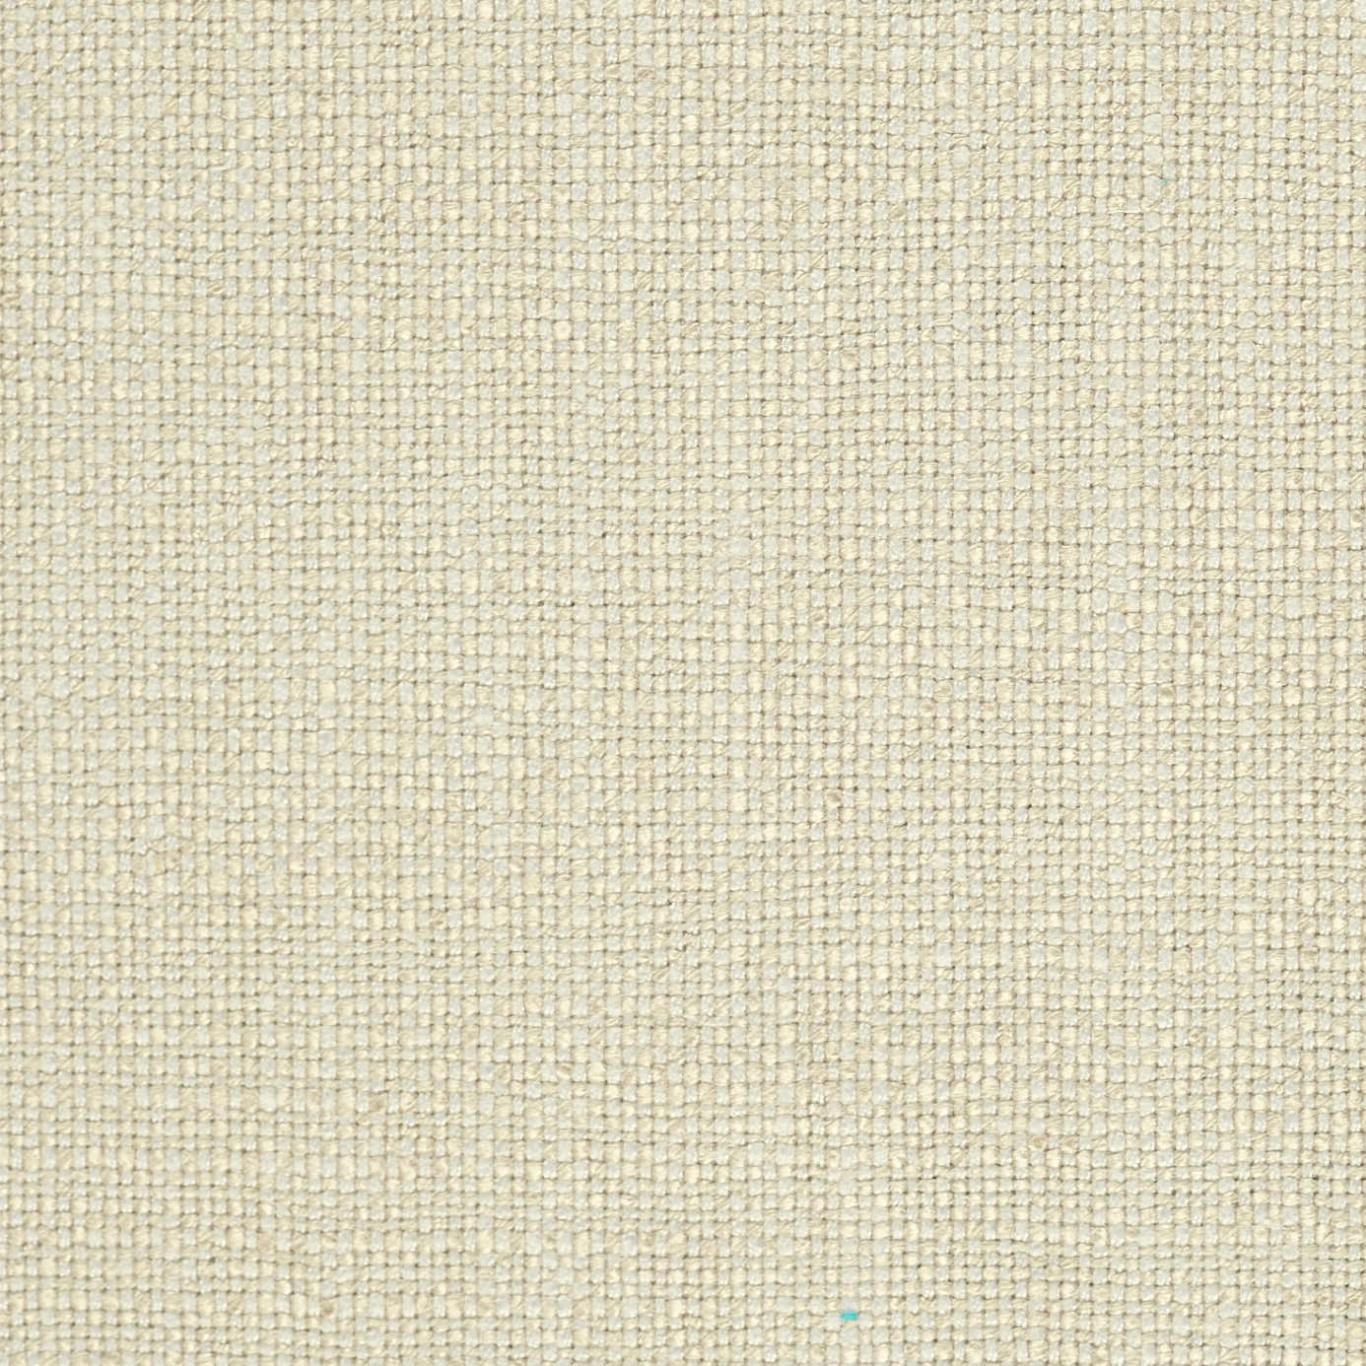 Image of Harlequin Fission Macadamia Fabric 440364